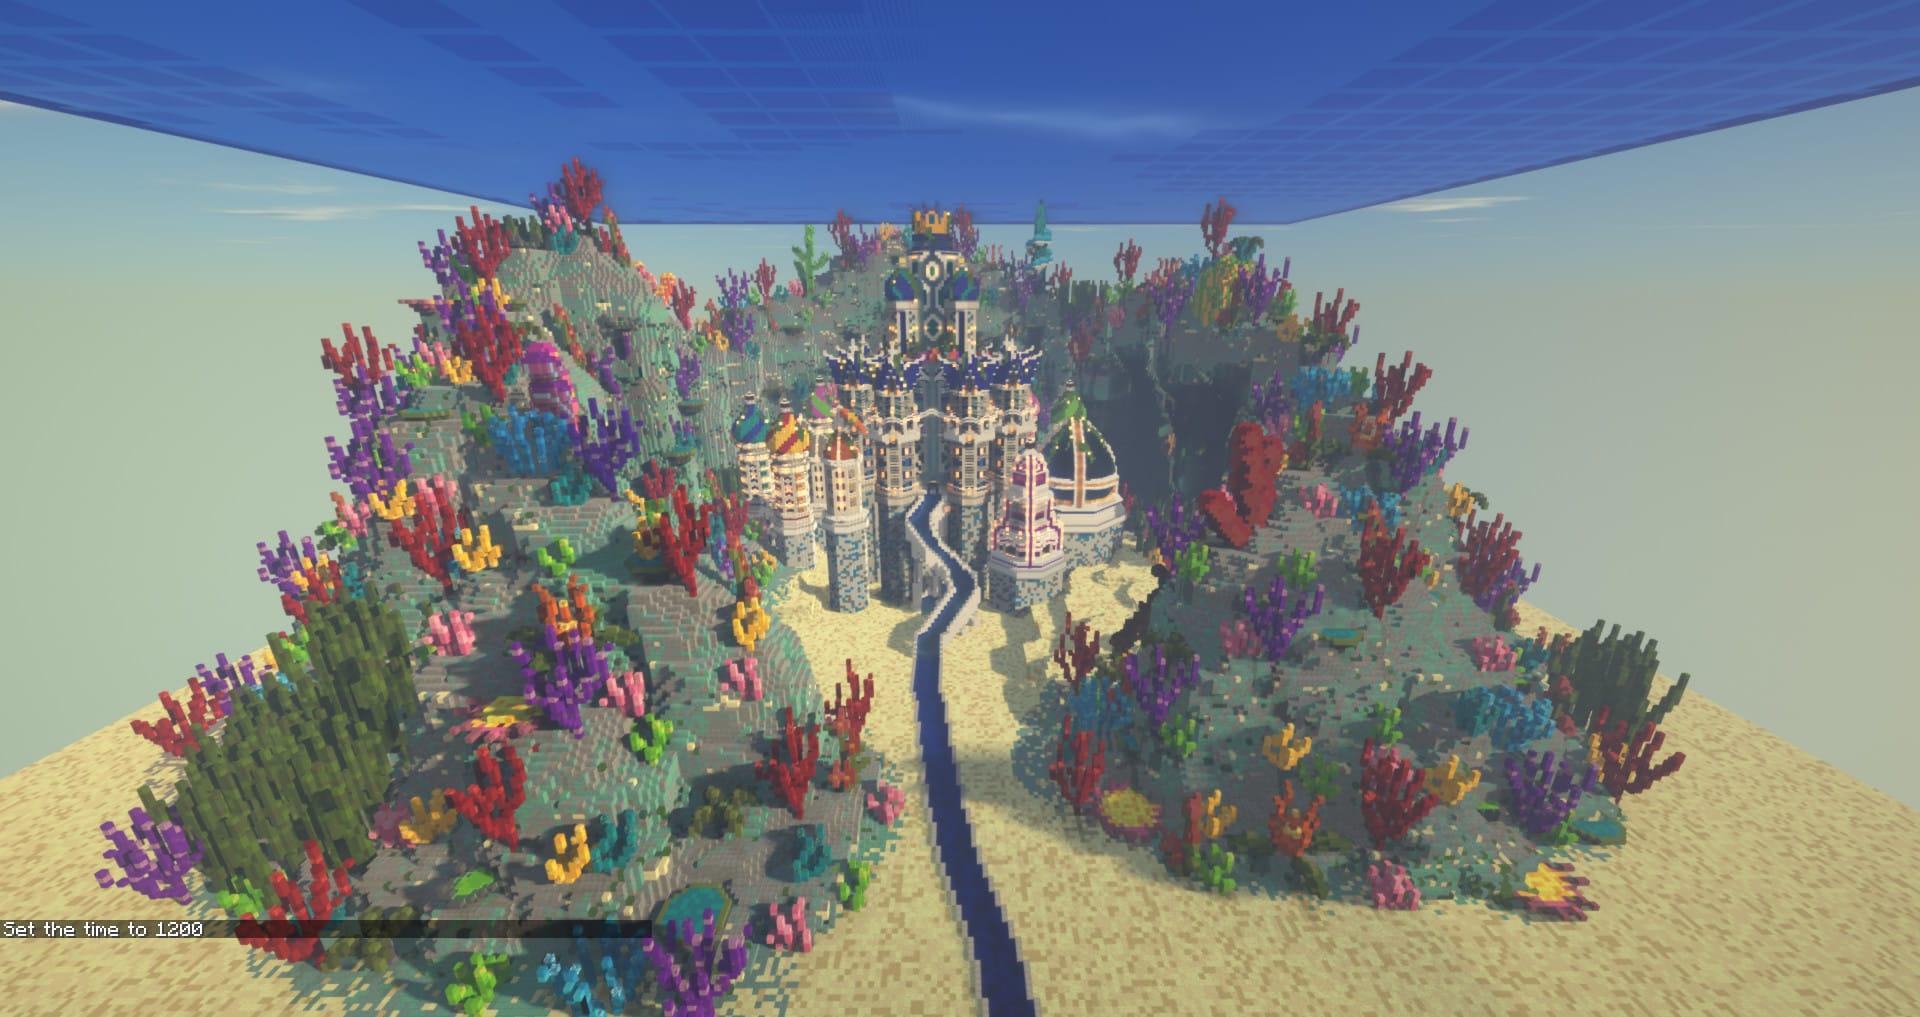 Minecraft 420x370 atlantis build for sale by Kyptin Fiverr